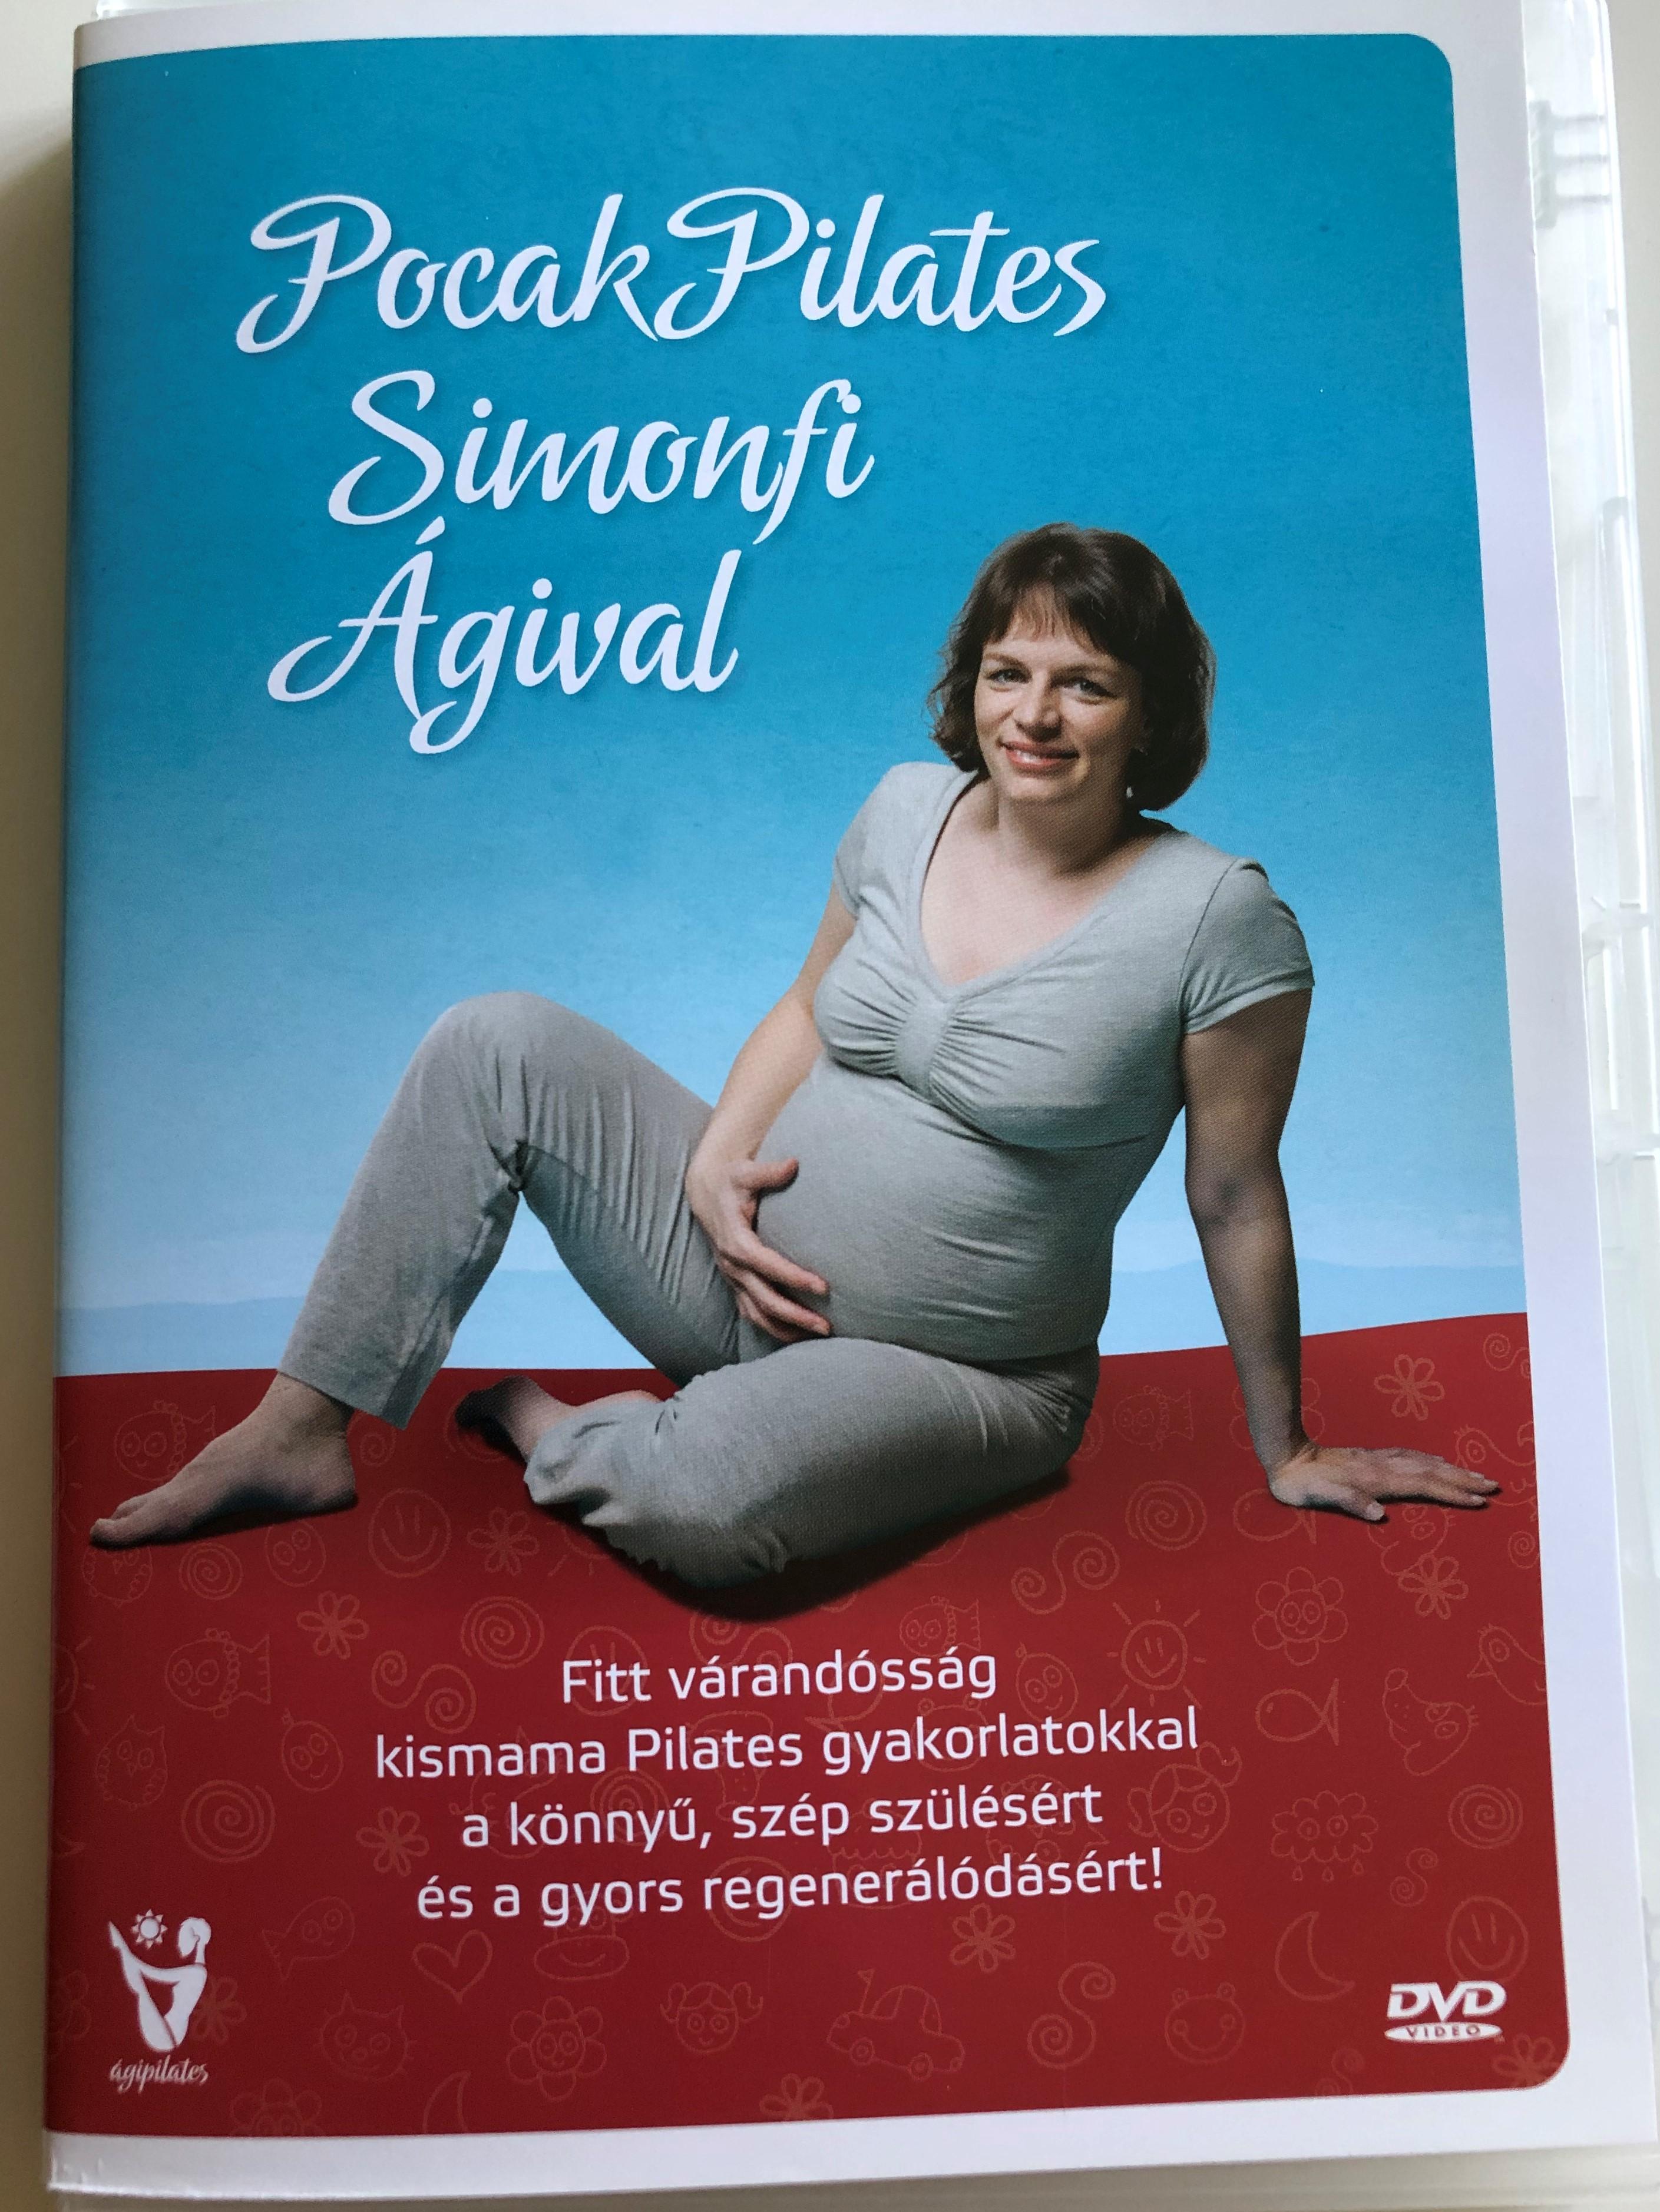 pocak-pilates-simonfi-gival-dvd-2011-pilates-for-pregnant-women-fitt-v-rand-s-g-kismama-pilates-gyakorlatokkal-a-k-nny-sz-p-sz-l-s-re-s-a-gyors-regener-l-d-s-rt-1-.jpg